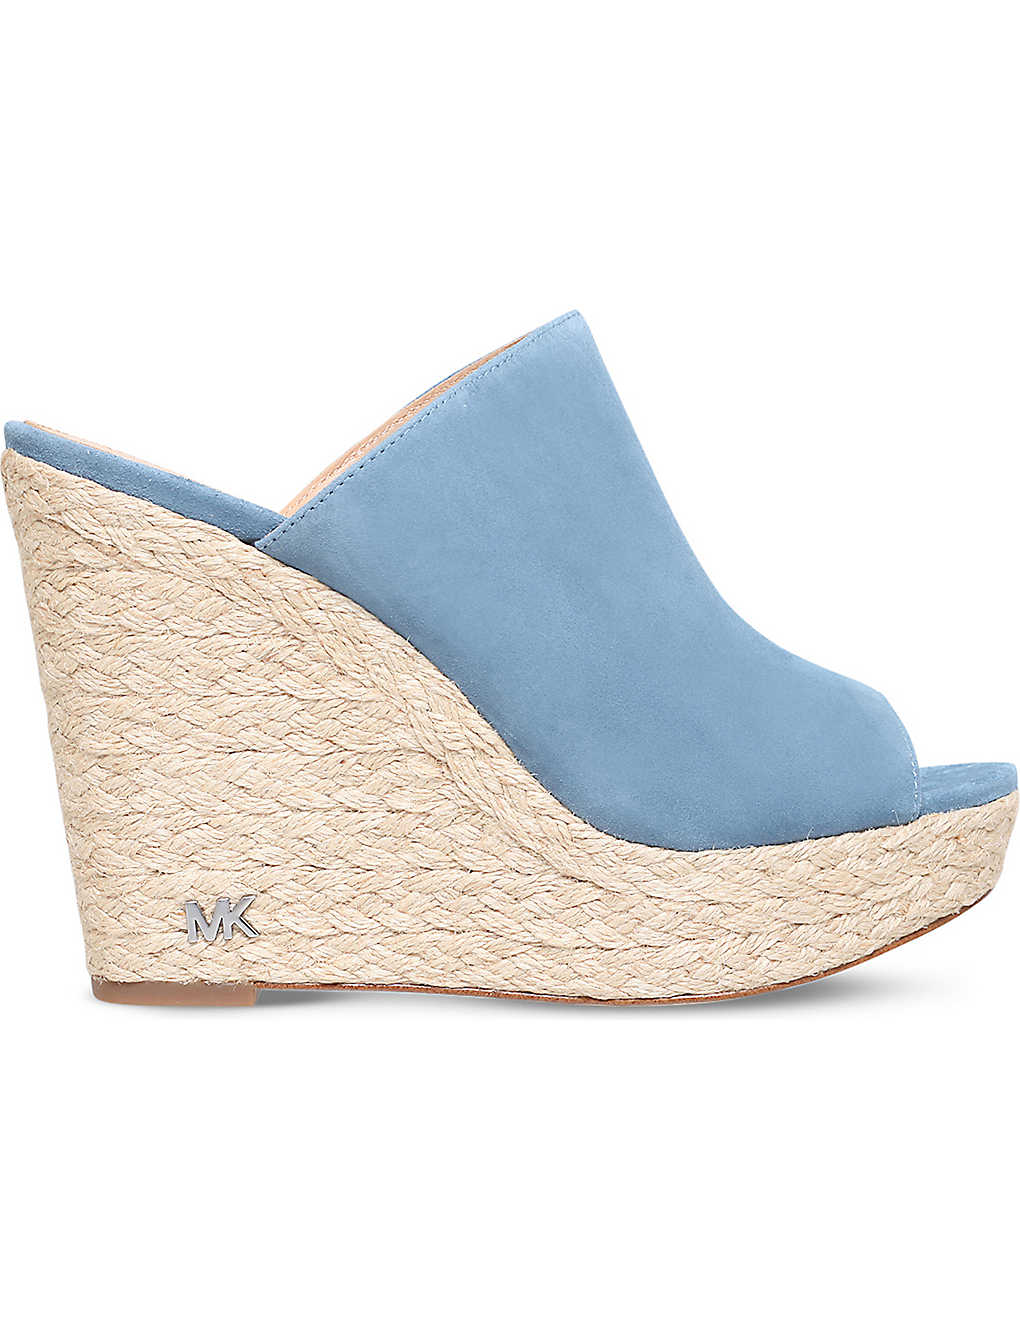 e34aaa336 MICHAEL MICHAEL KORS - Hastings suede wedge sandals | Selfridges.com